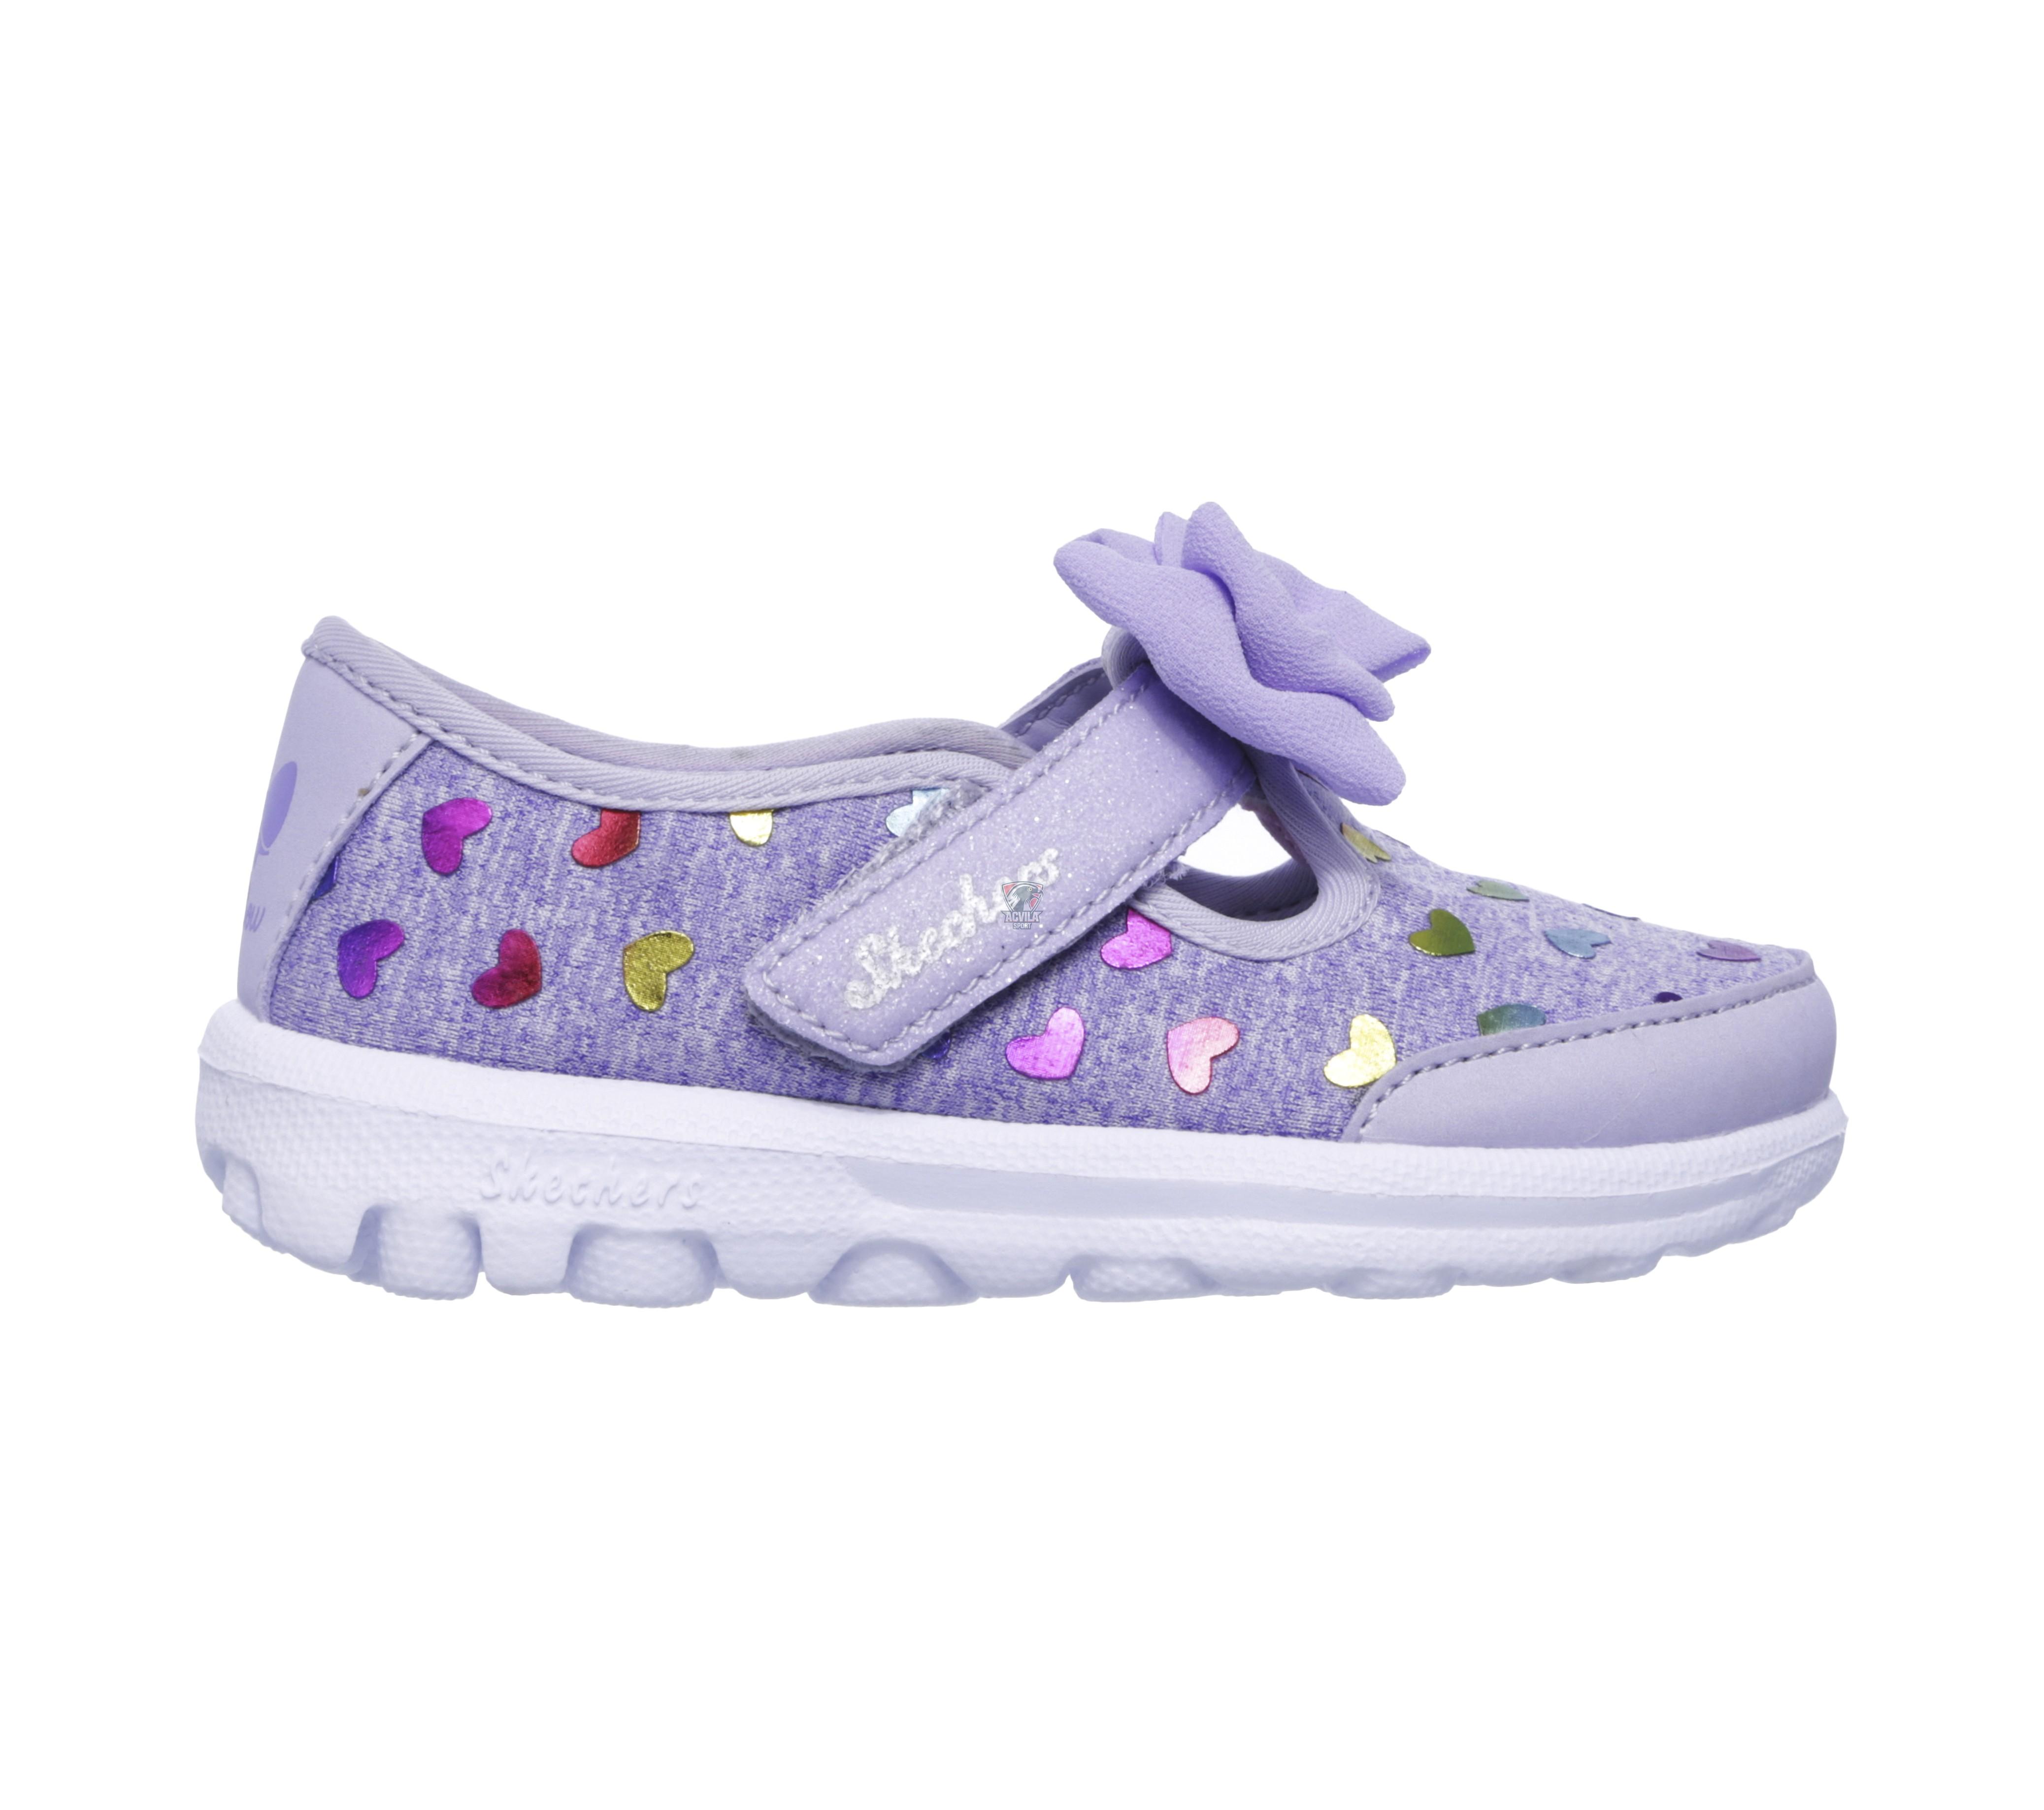 photo 2 Детская обувь SKECHERS DYNAMIGHT - LEAD RUNNER